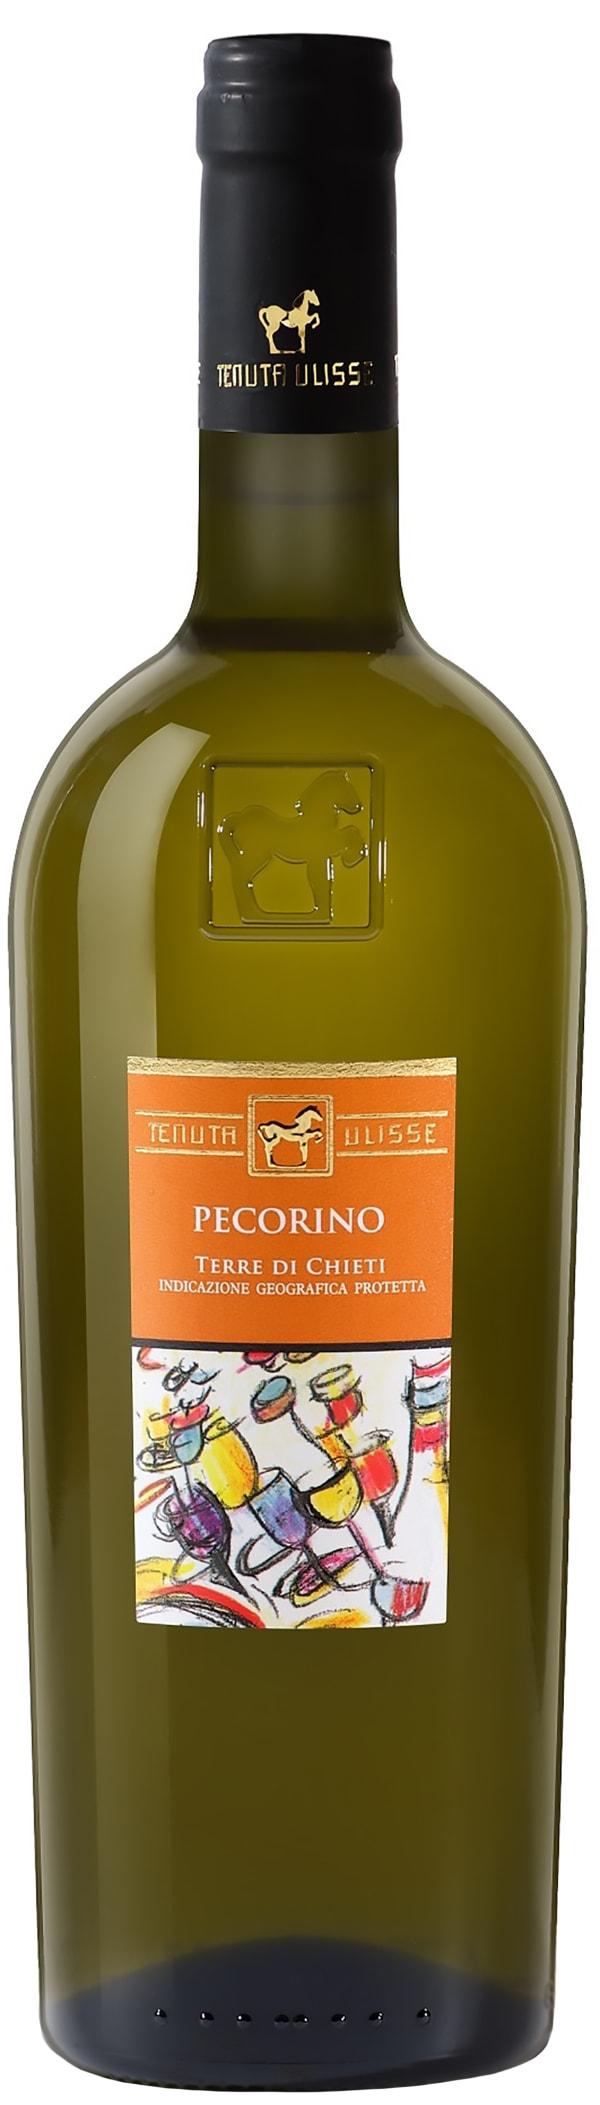 Tenuta Ulisse Pecorino 2018